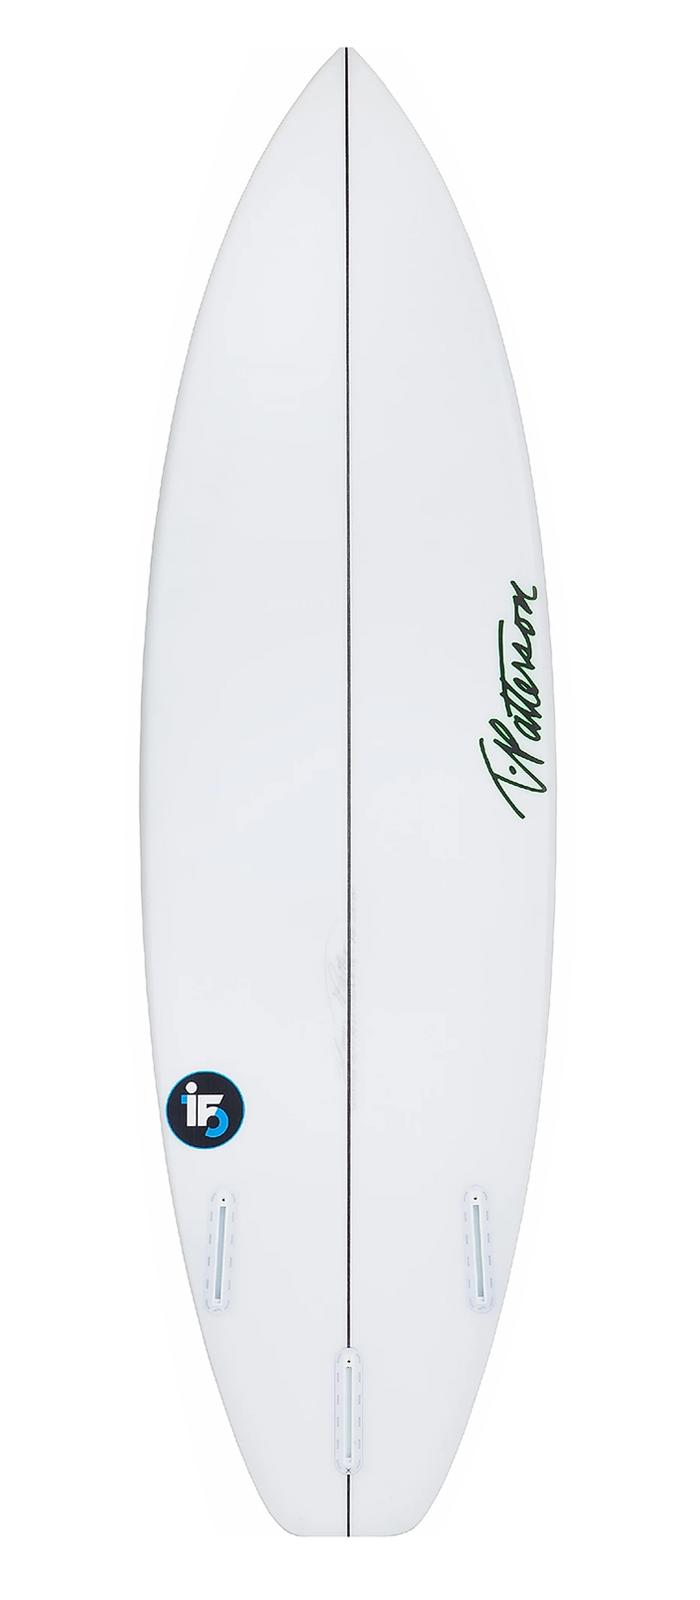 POOL PARTY - 1 surfboard model bottom